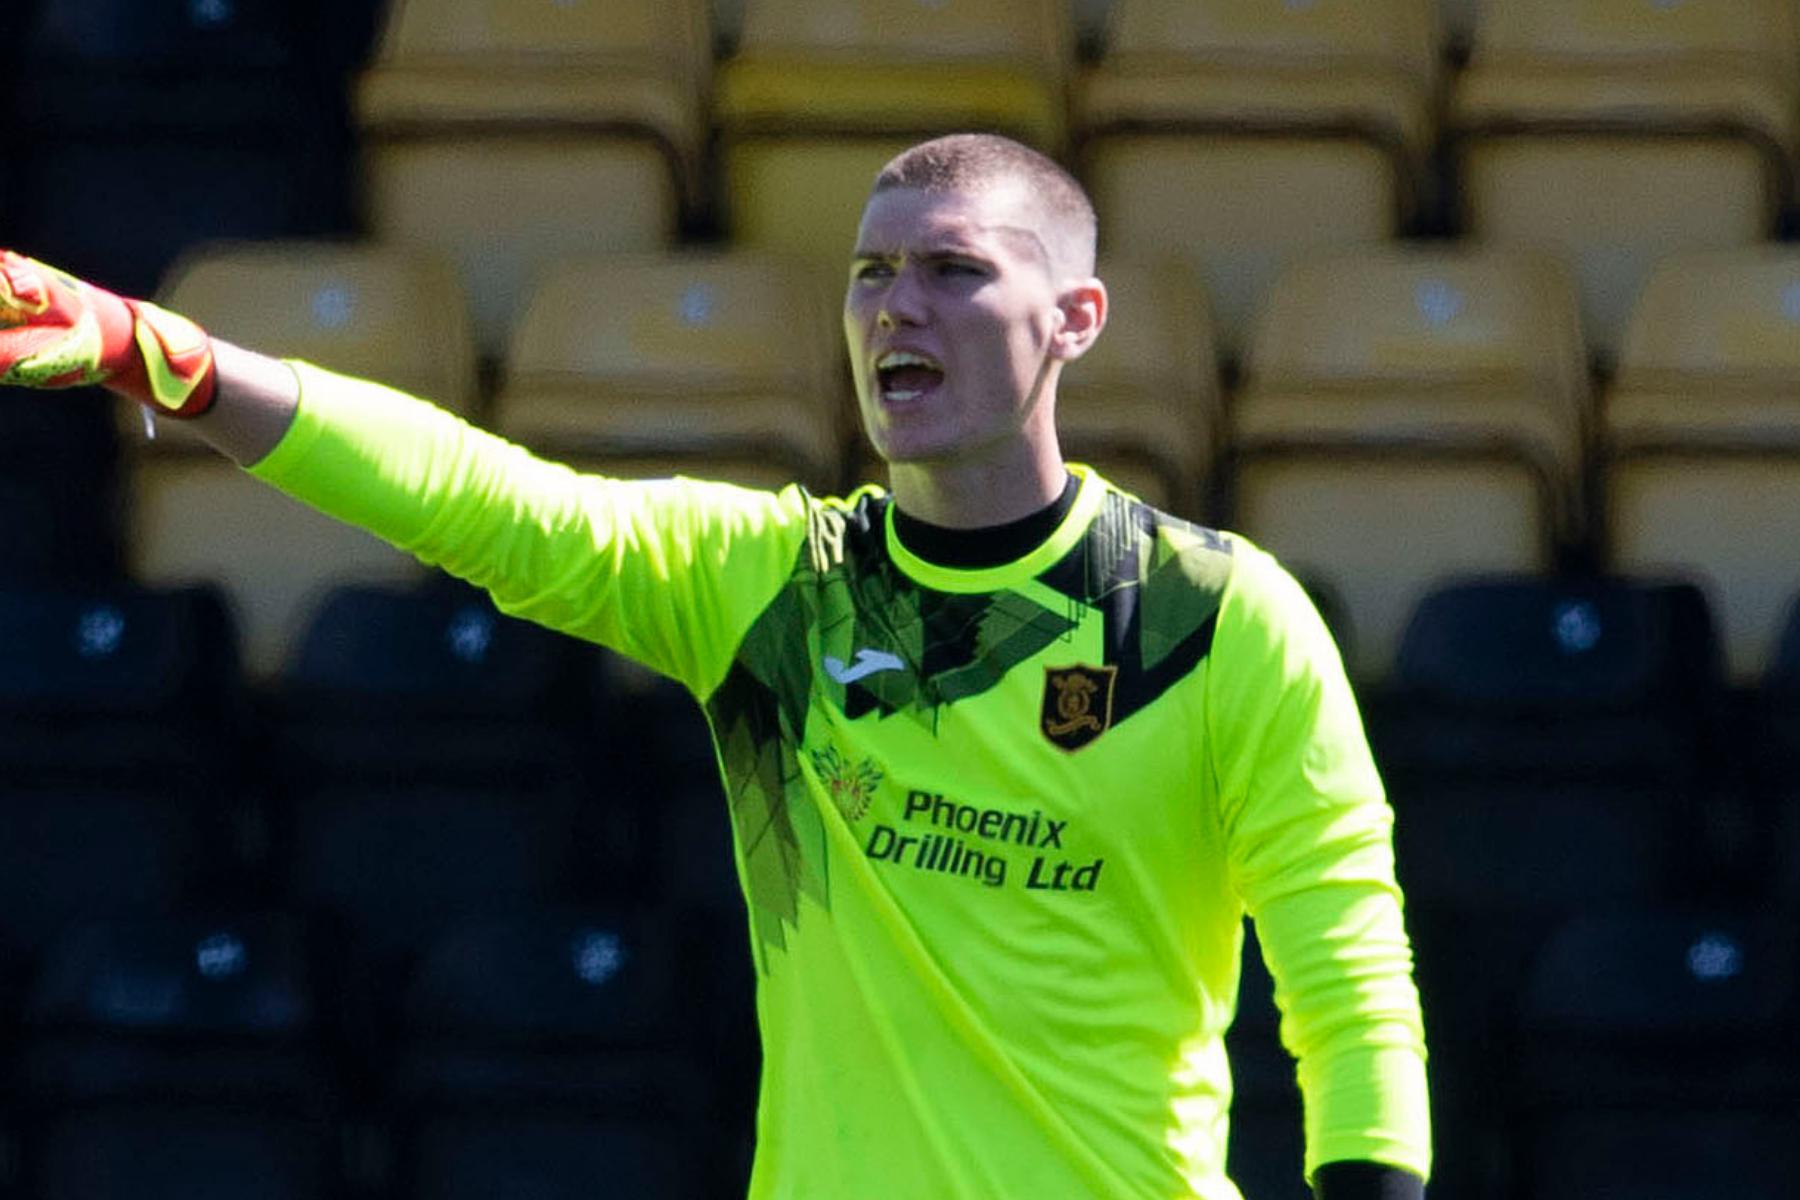 Livingston goalkeeper Daniel Barden diagnosed with testicular cancer